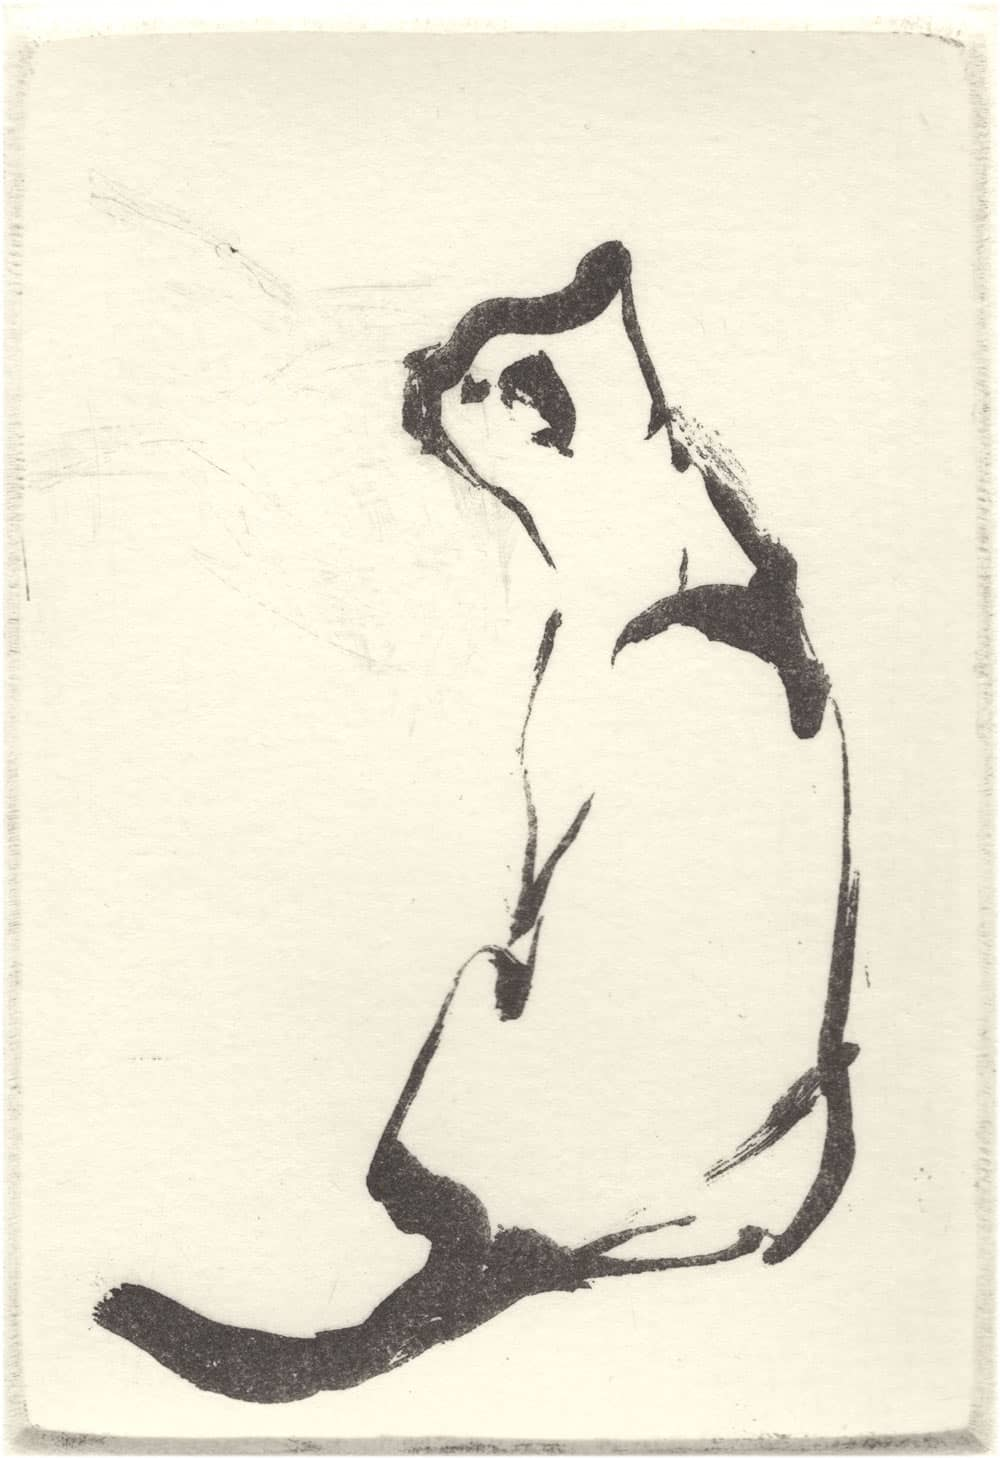 """Scent"" - brush drawing of a sitting cat catching a scent. Original print sugar-lift aquatint by painter-printmaker Marina Kim"